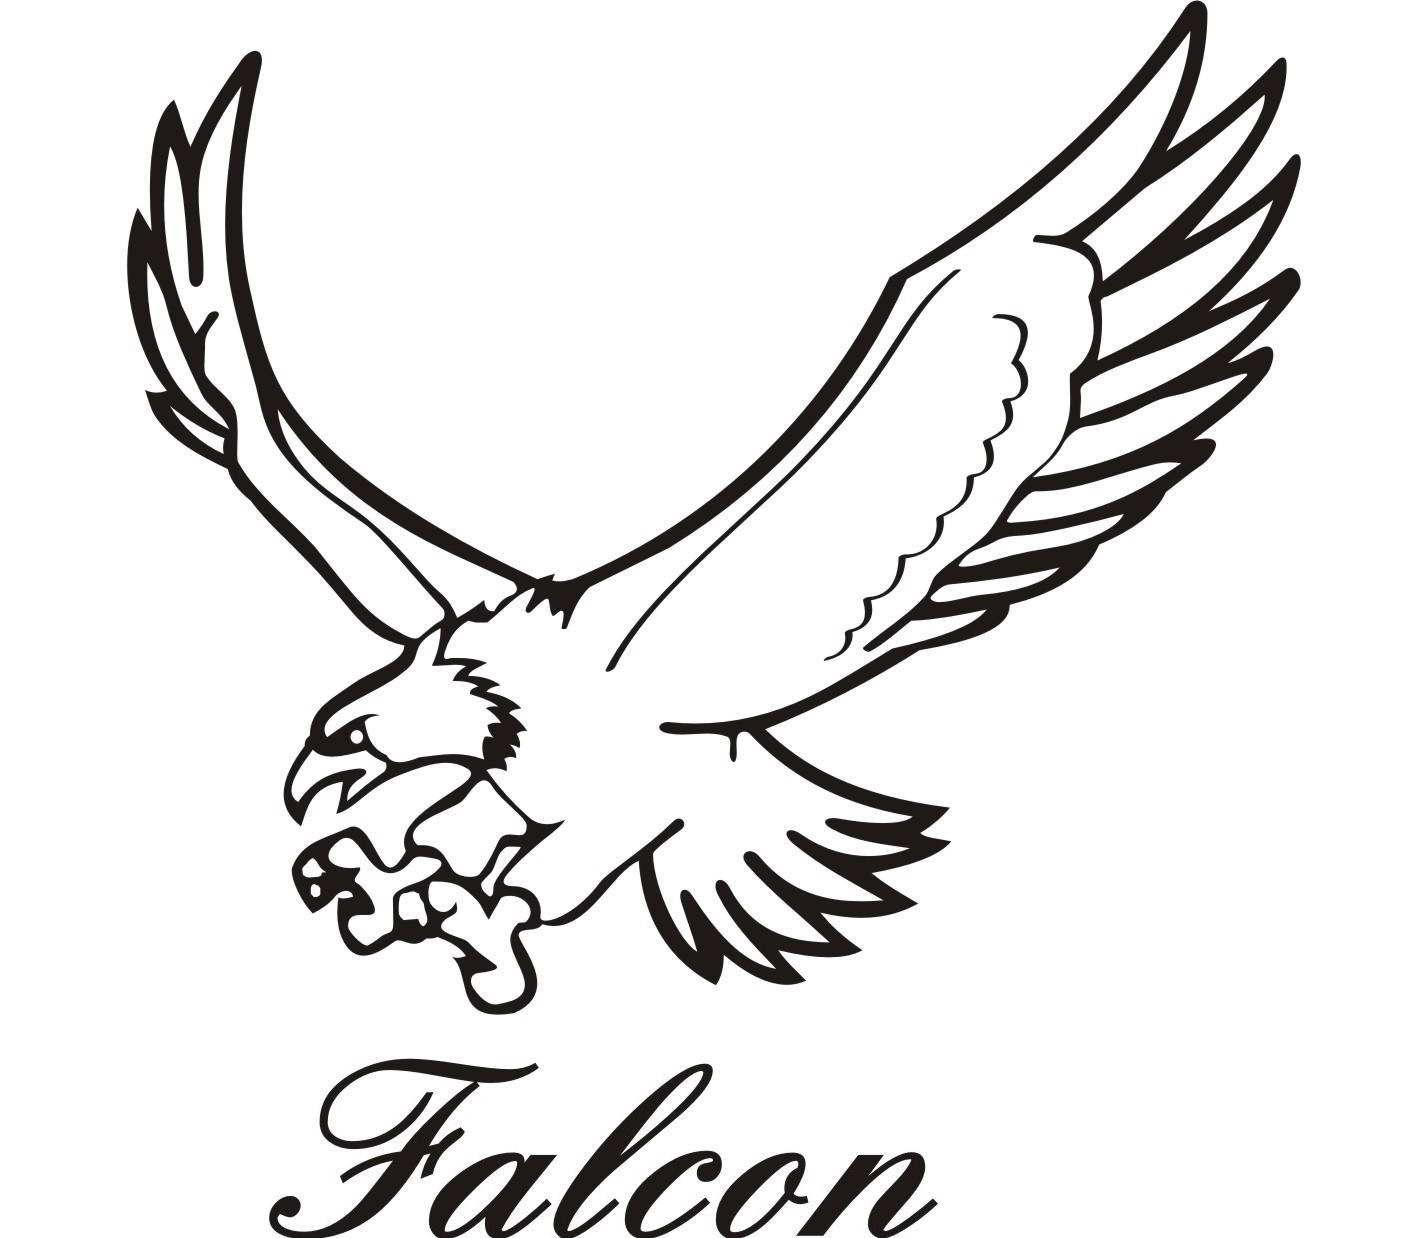 Drawn falcon falcon wing Wing photo#11 Falcon Drawing Wing